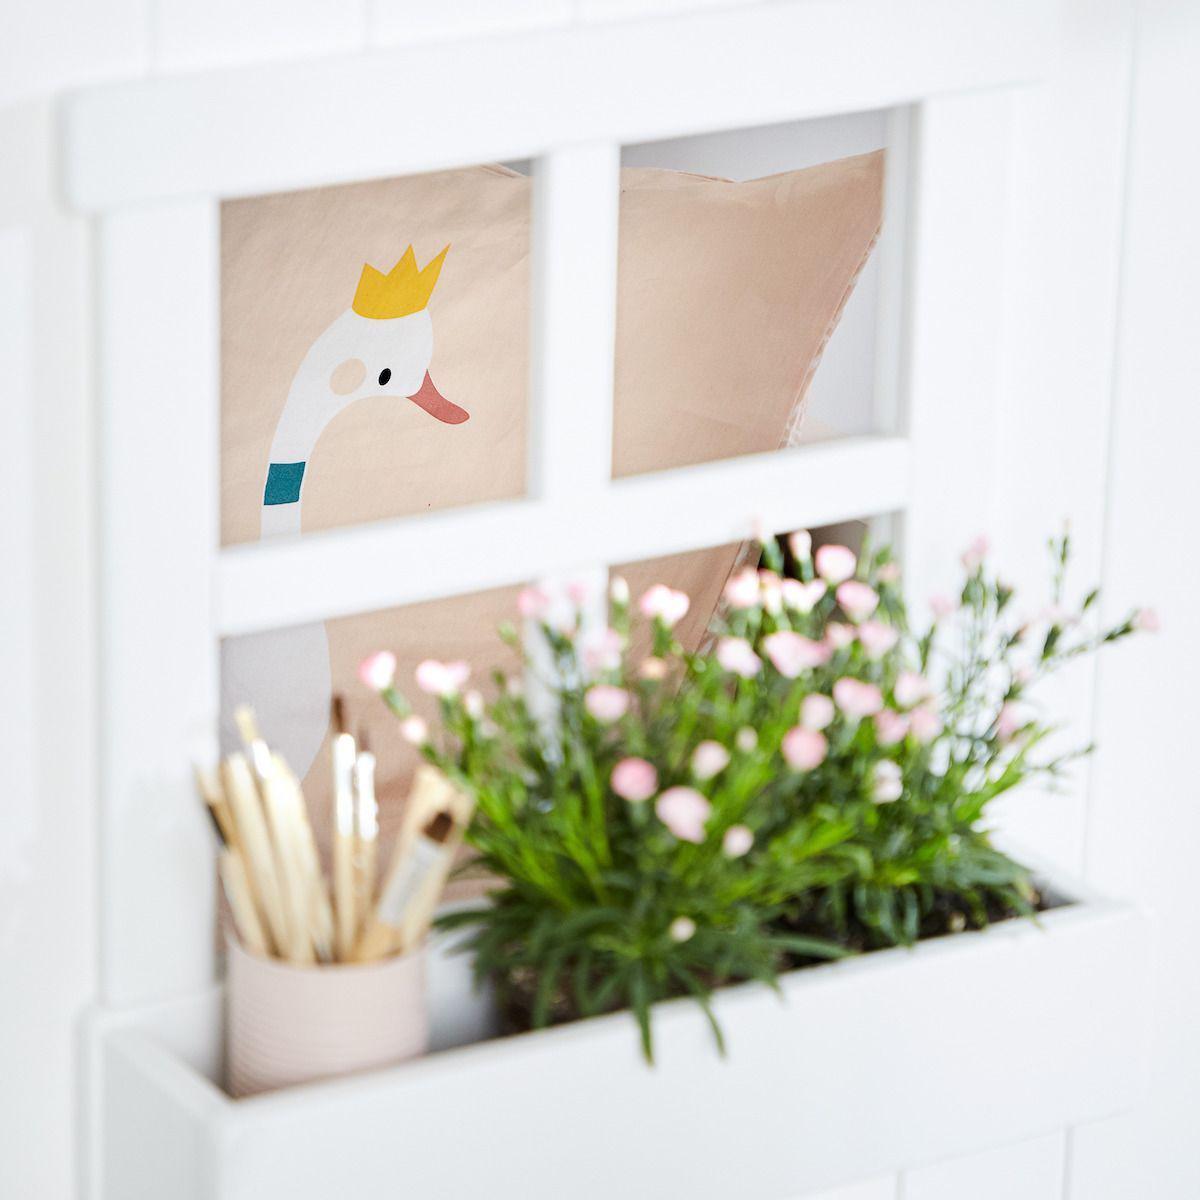 Spielbett Baumhaus 90x200cm PLAY HOUSE CLASSIC Flexa weiß-grey washed